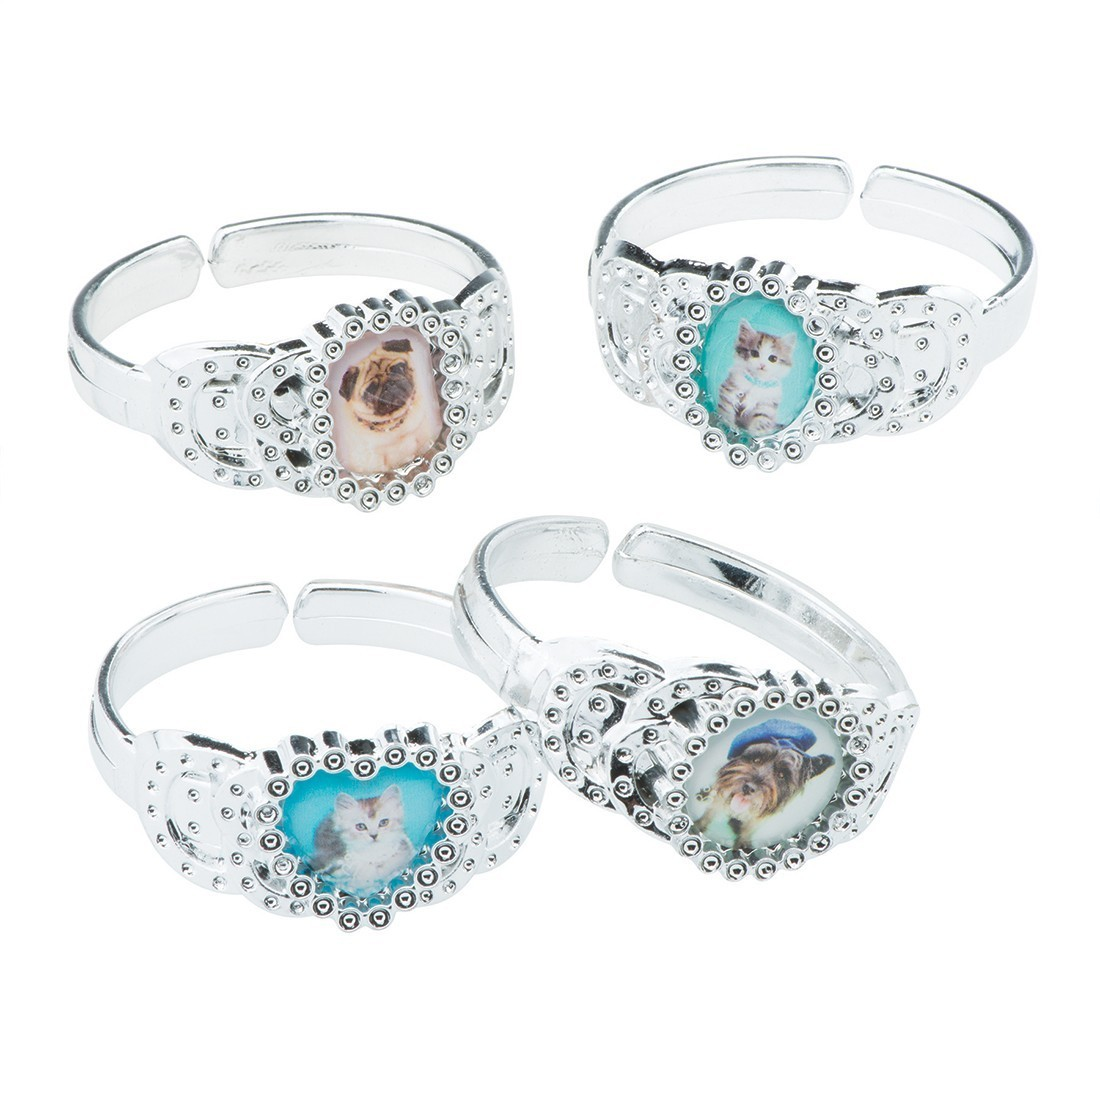 Rachael Hale Jewel Bracelets  [image]